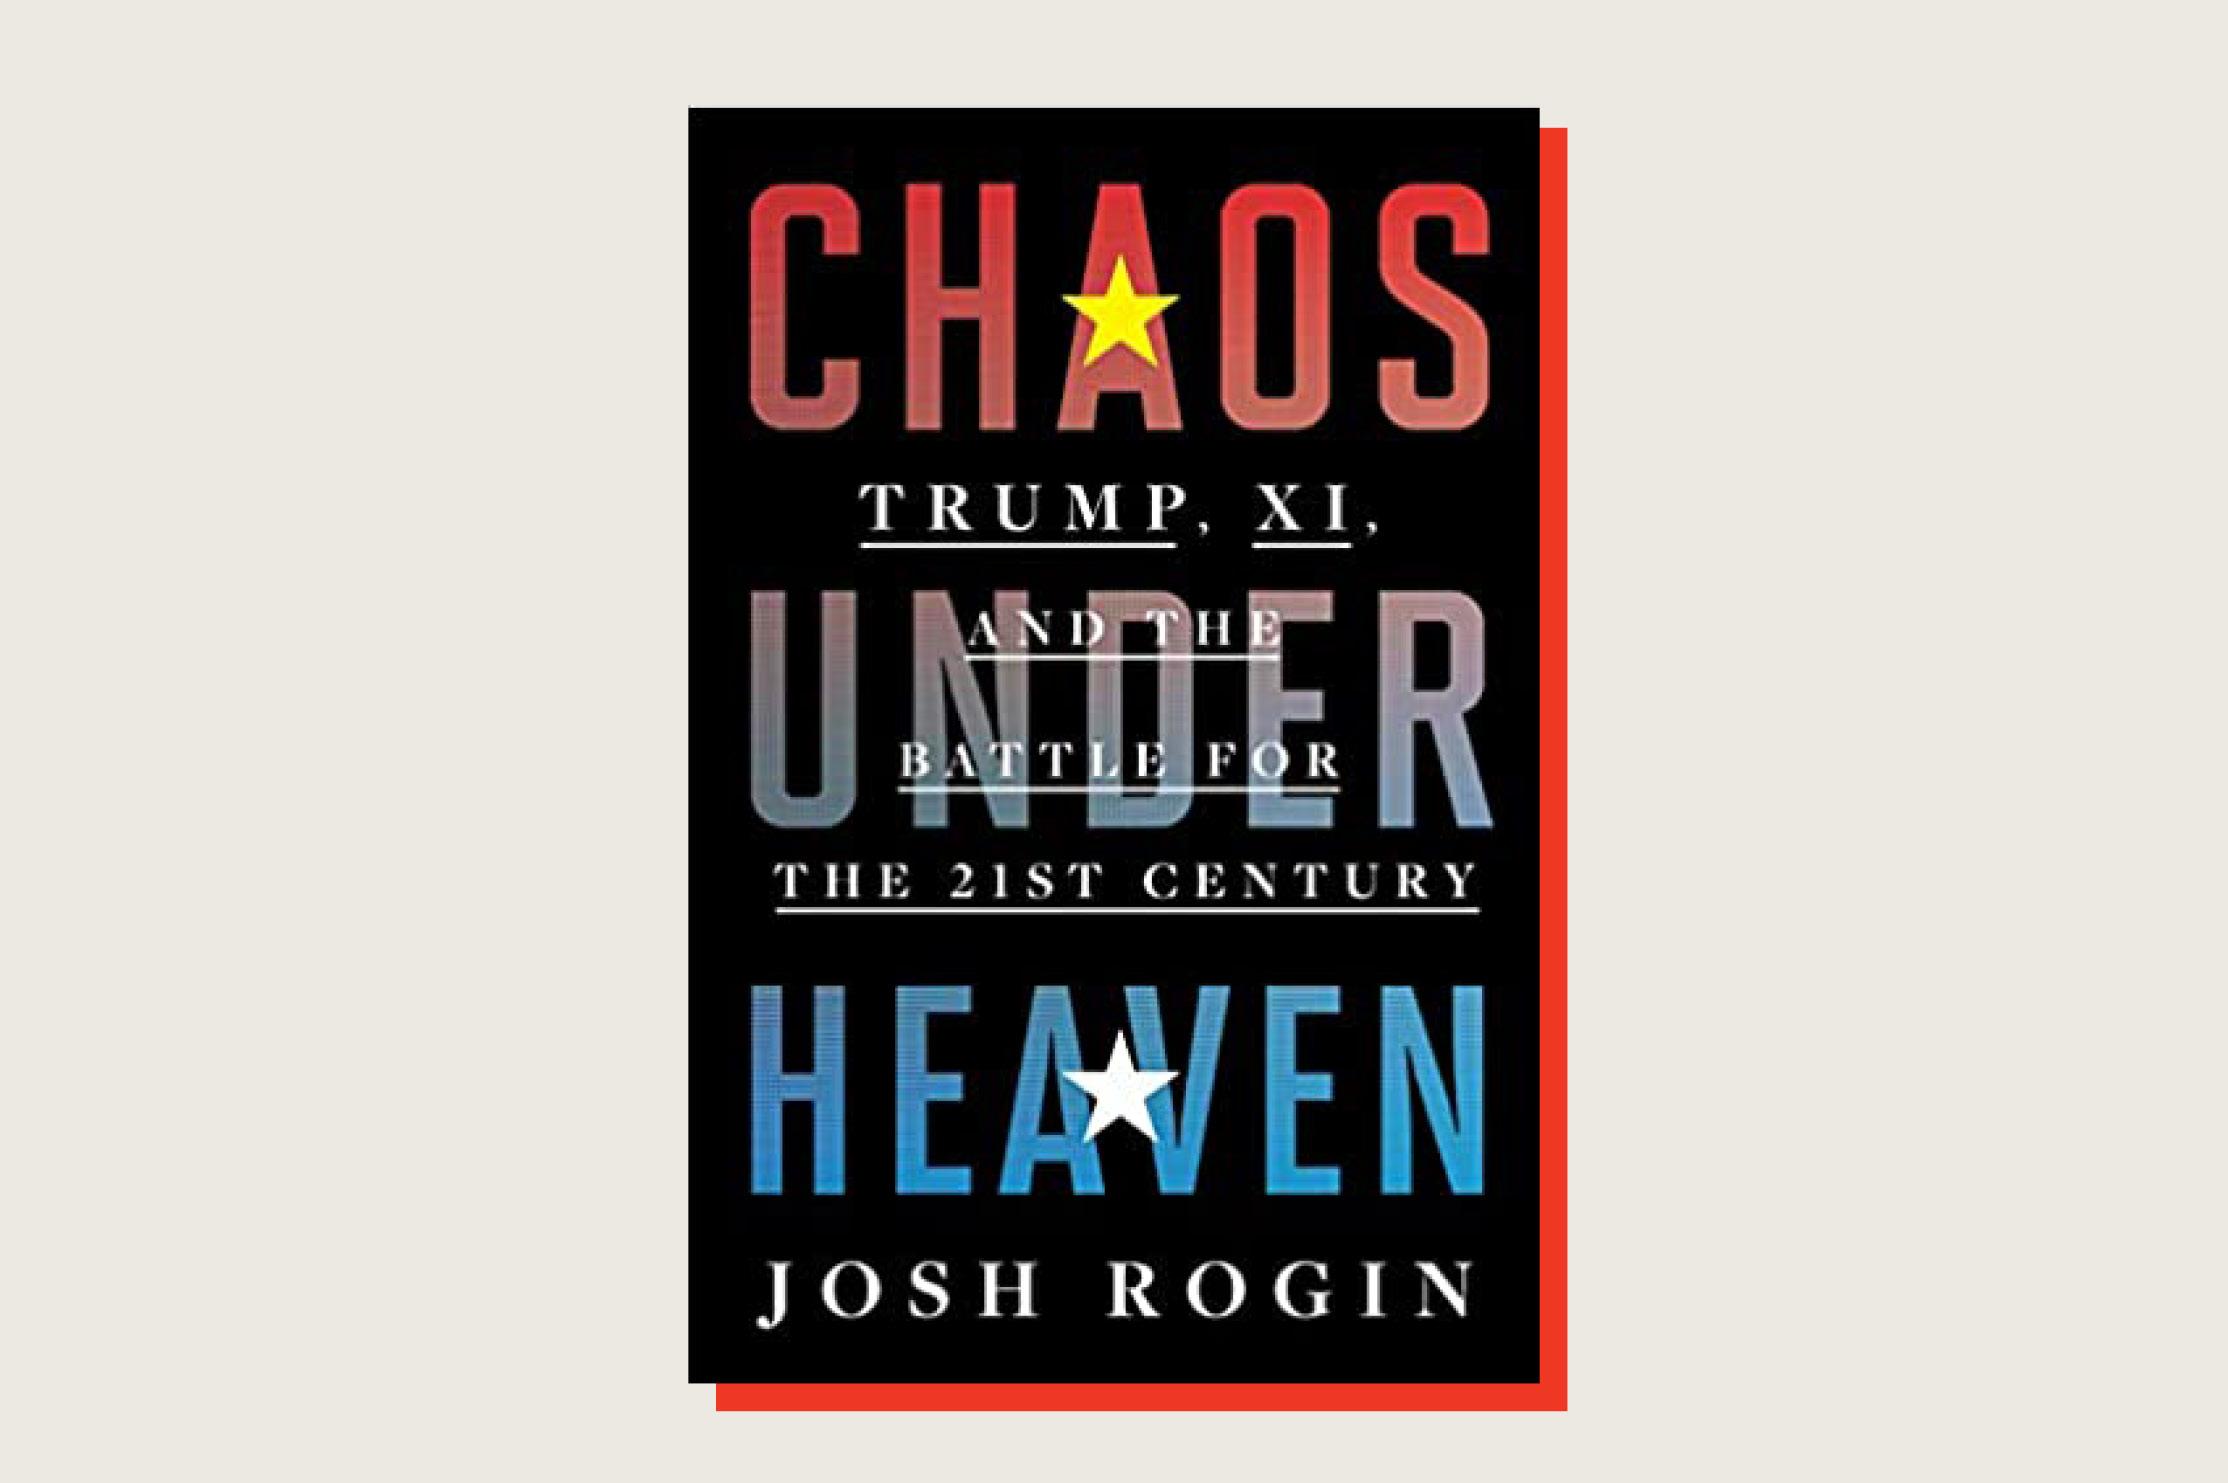 Chaos Under Heaven,Josh Rogin, Houghton Mifflin Harcourt, 384 pp., $30.00, March 2021